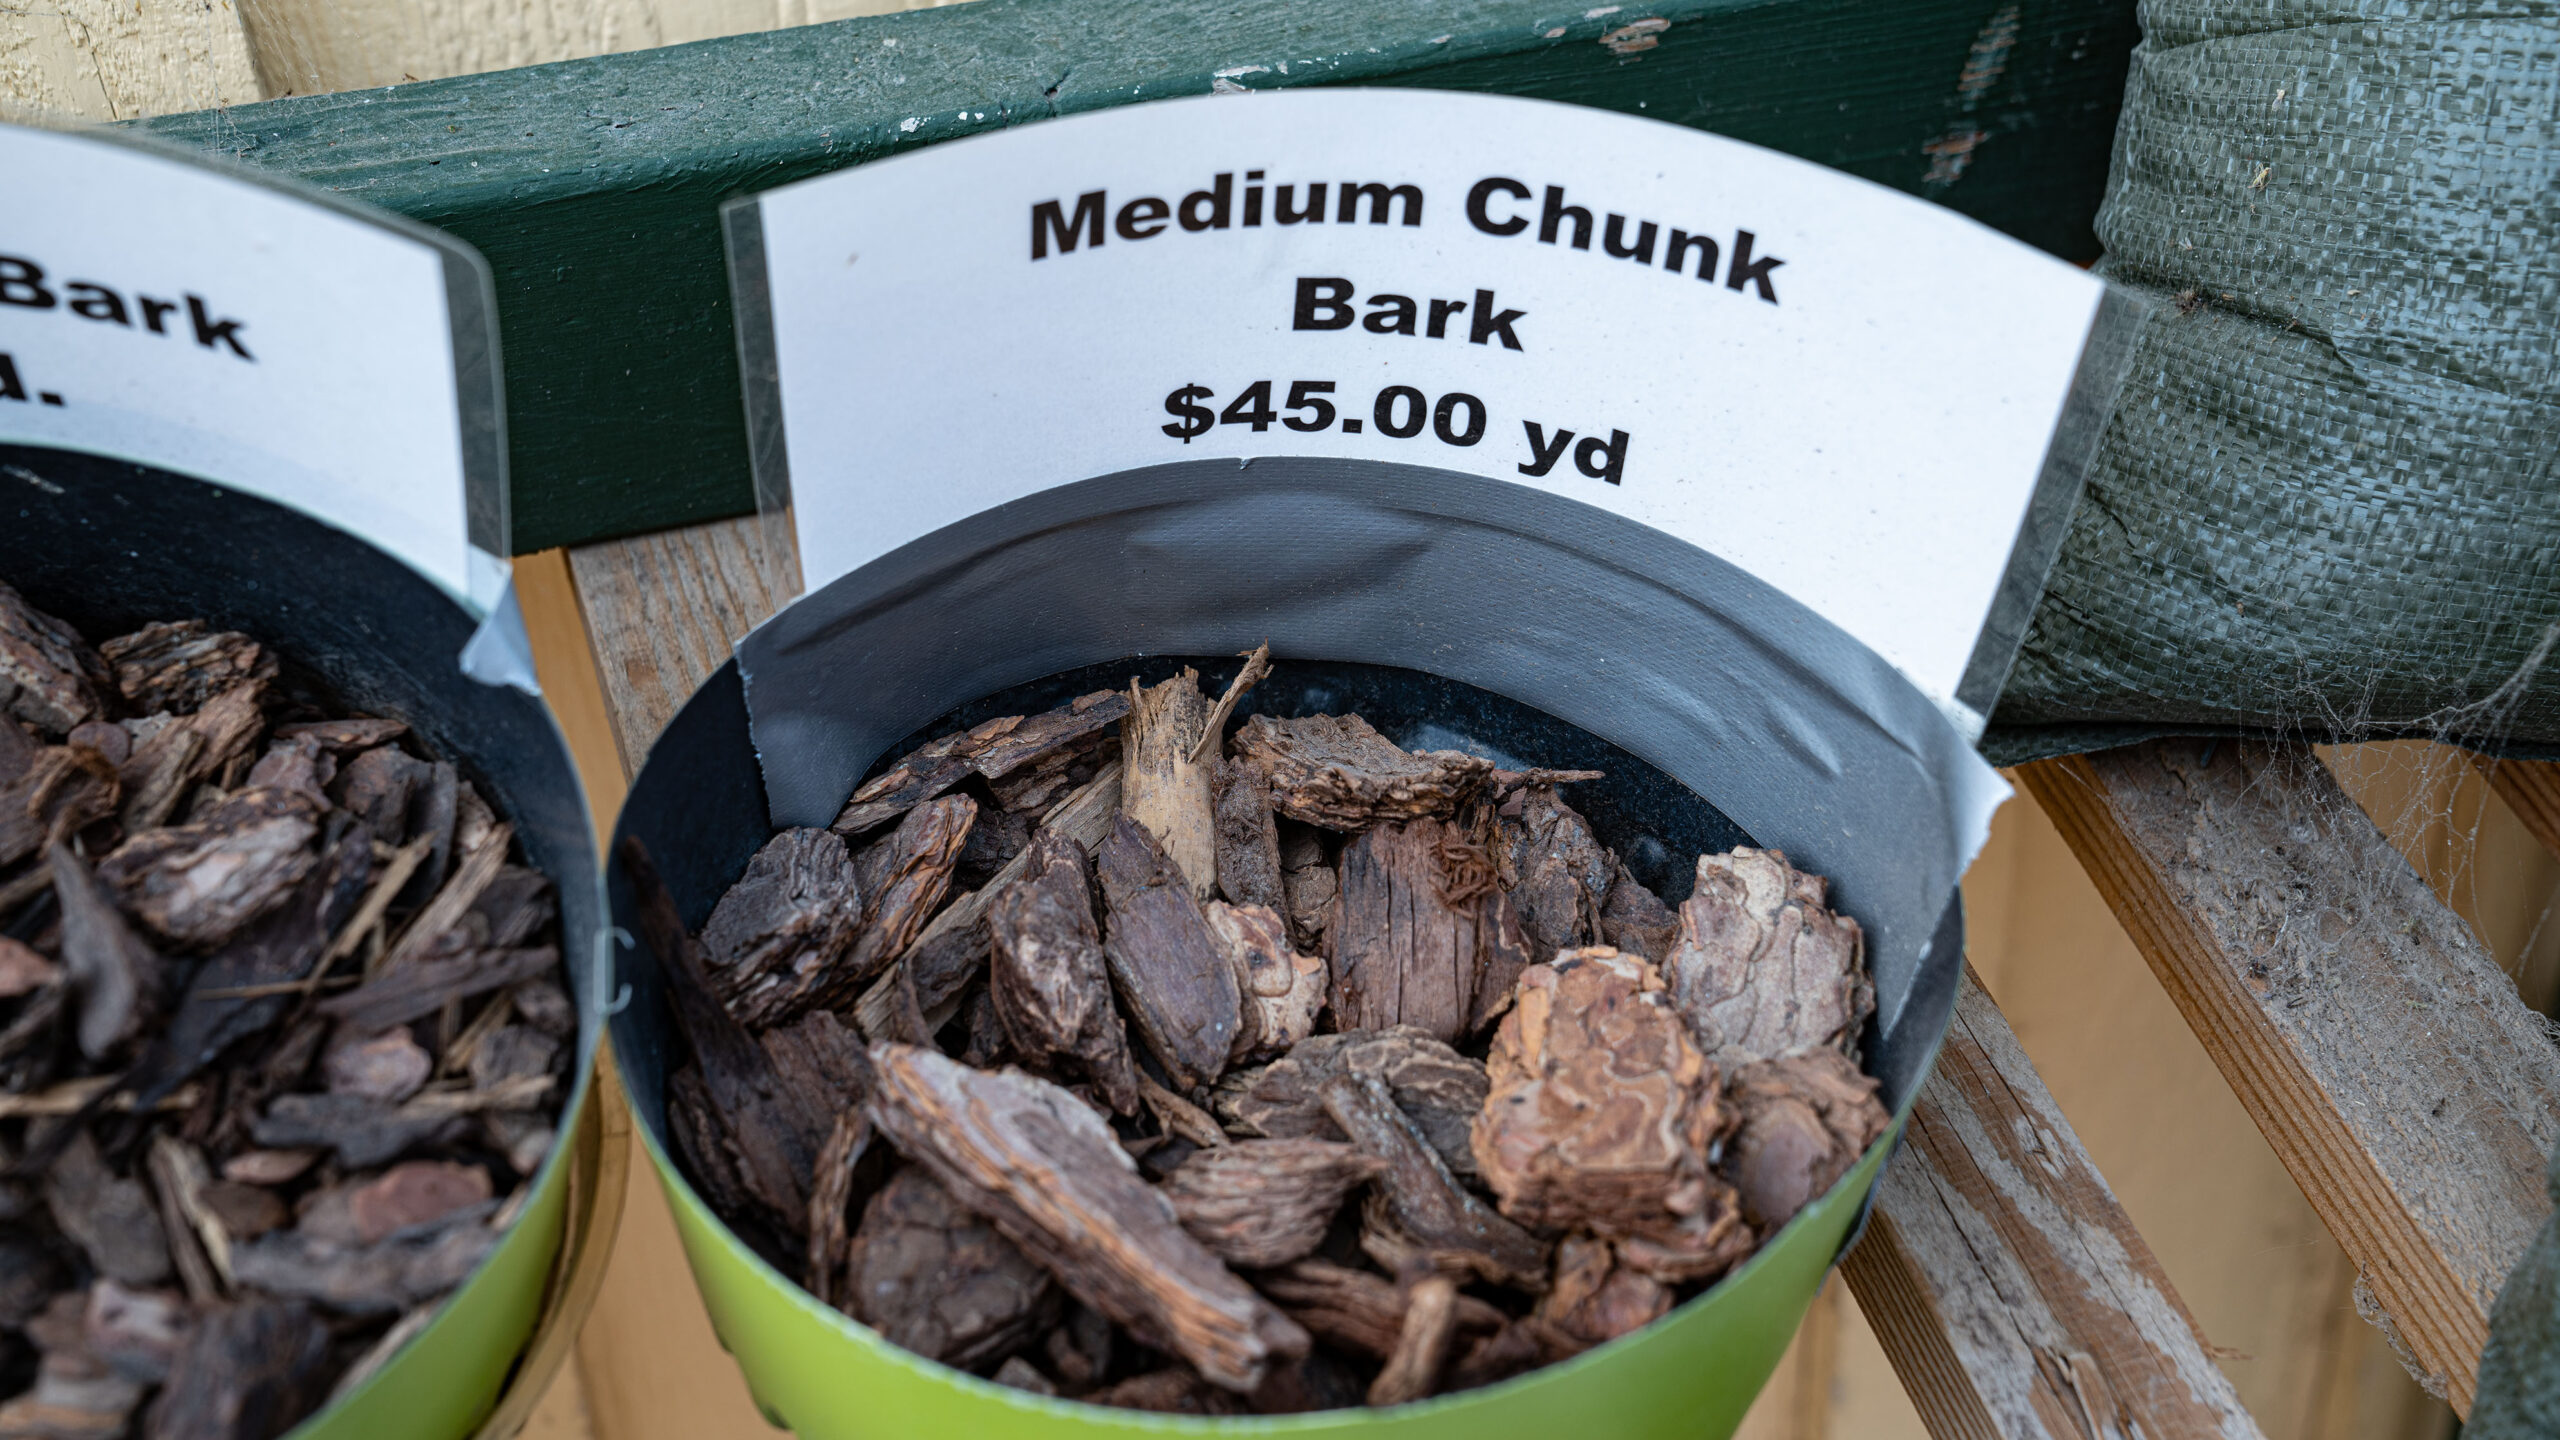 Medium Chunk Bark - Adams Gardens